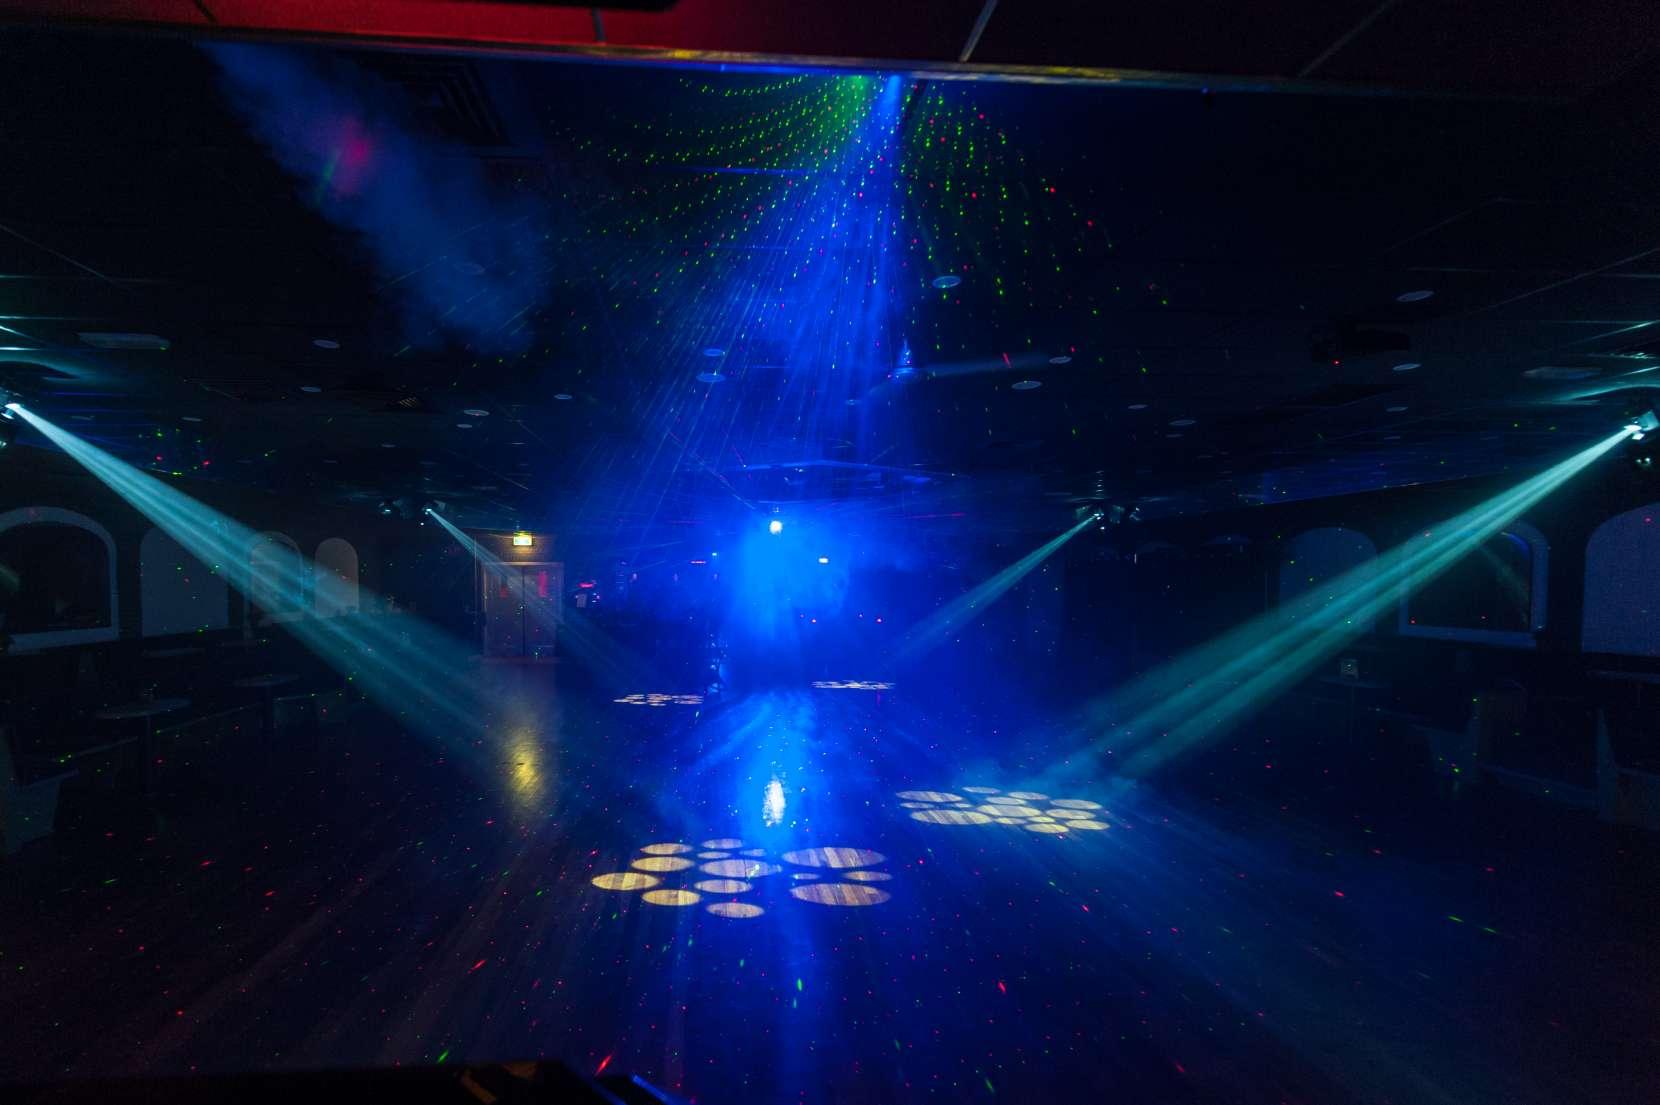 Led-verlichting-4-1660x1105.jpg